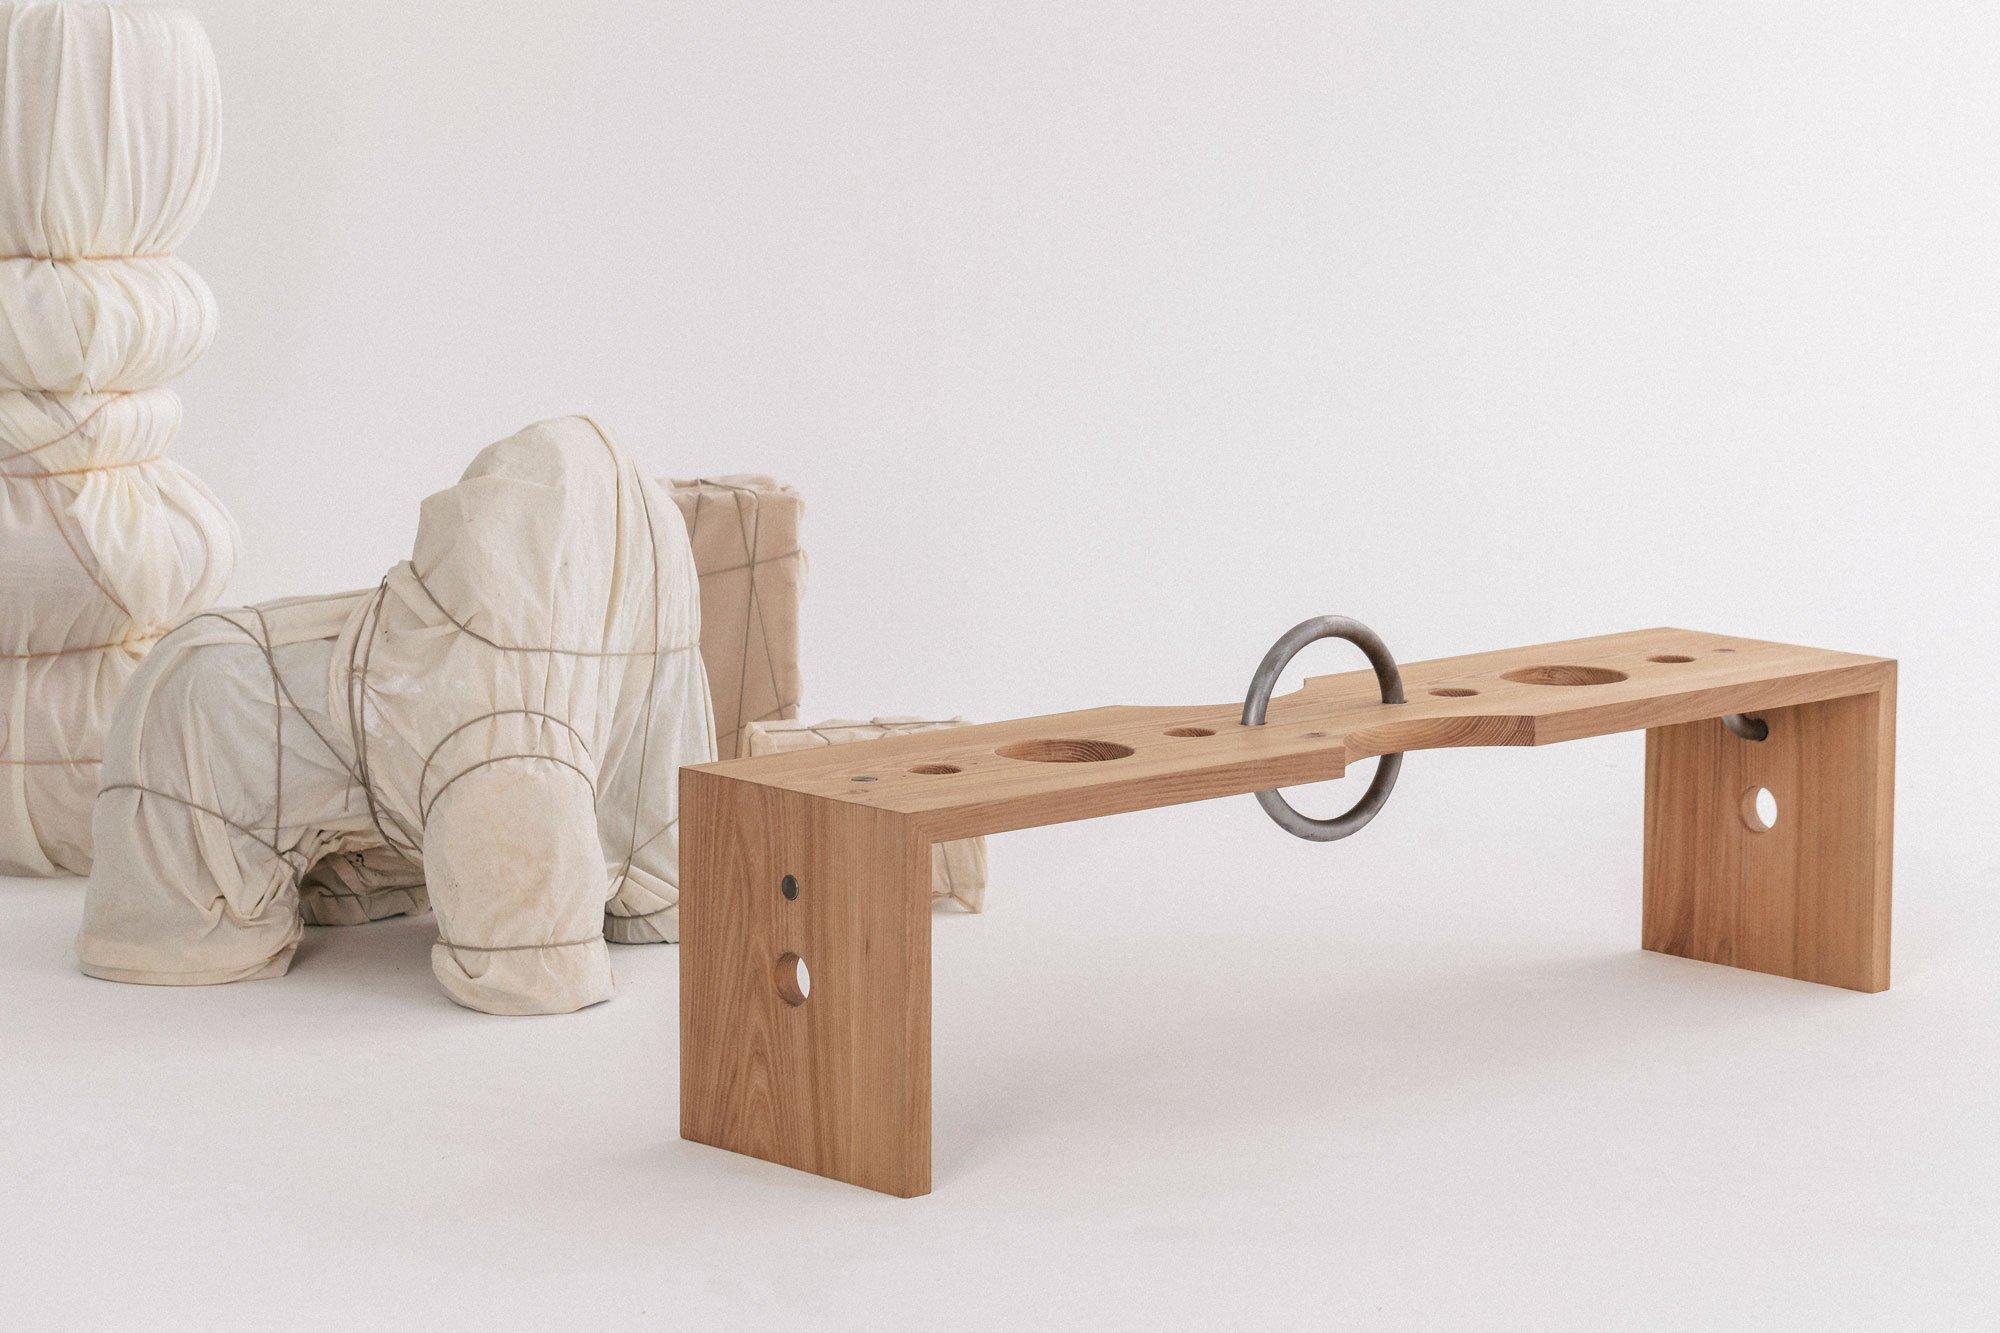 Ukurant Objects, 3daysofdesign 2020, jeunes designers, Josefine Krabbe Munck and Simone Øster